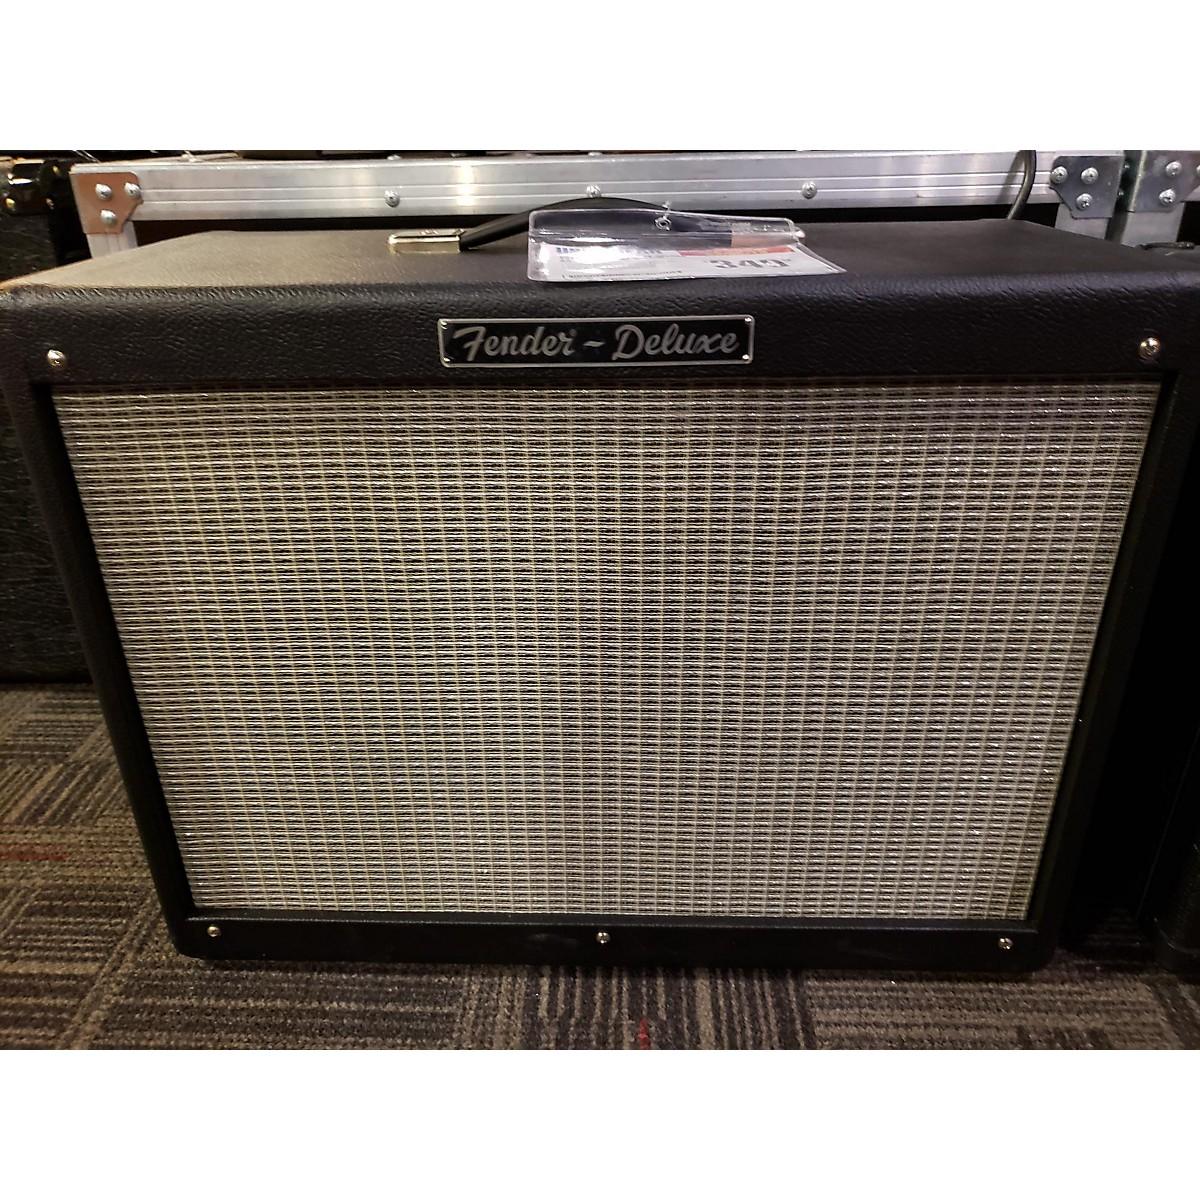 Fender HOT ROD DELUXE 1X12 ENCLOSURE Guitar Cabinet